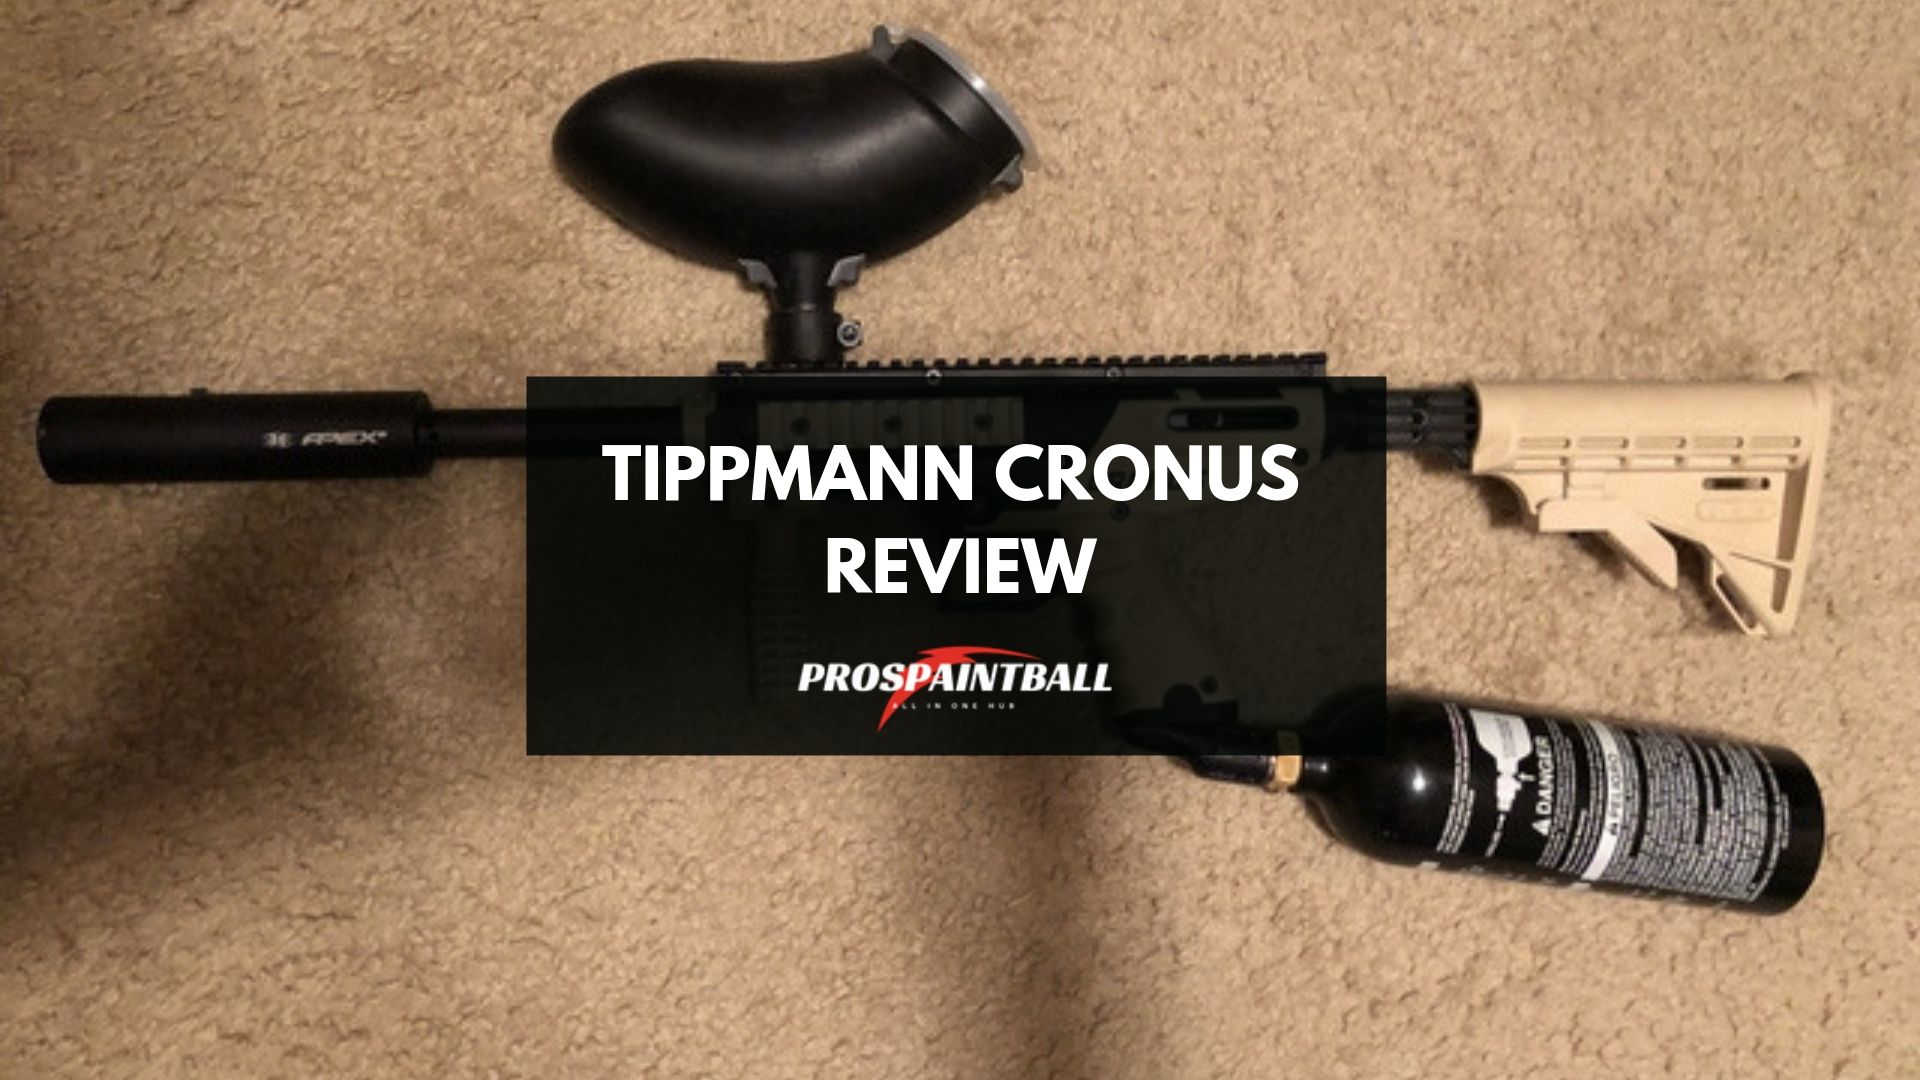 Tippmann Cronus Review-